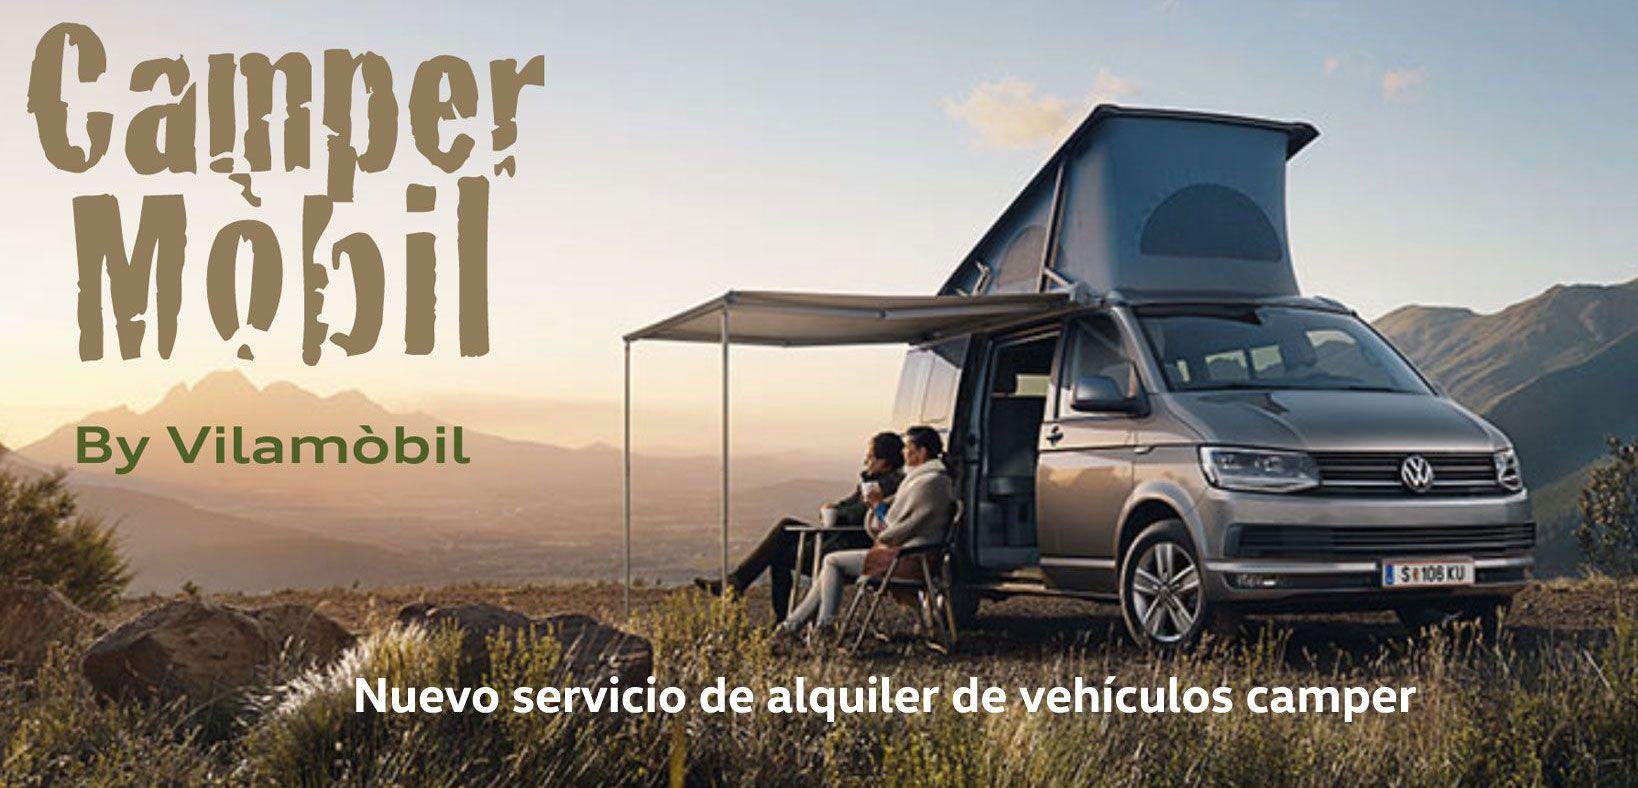 Campermóbil, alquiler de vehiculos camper i california